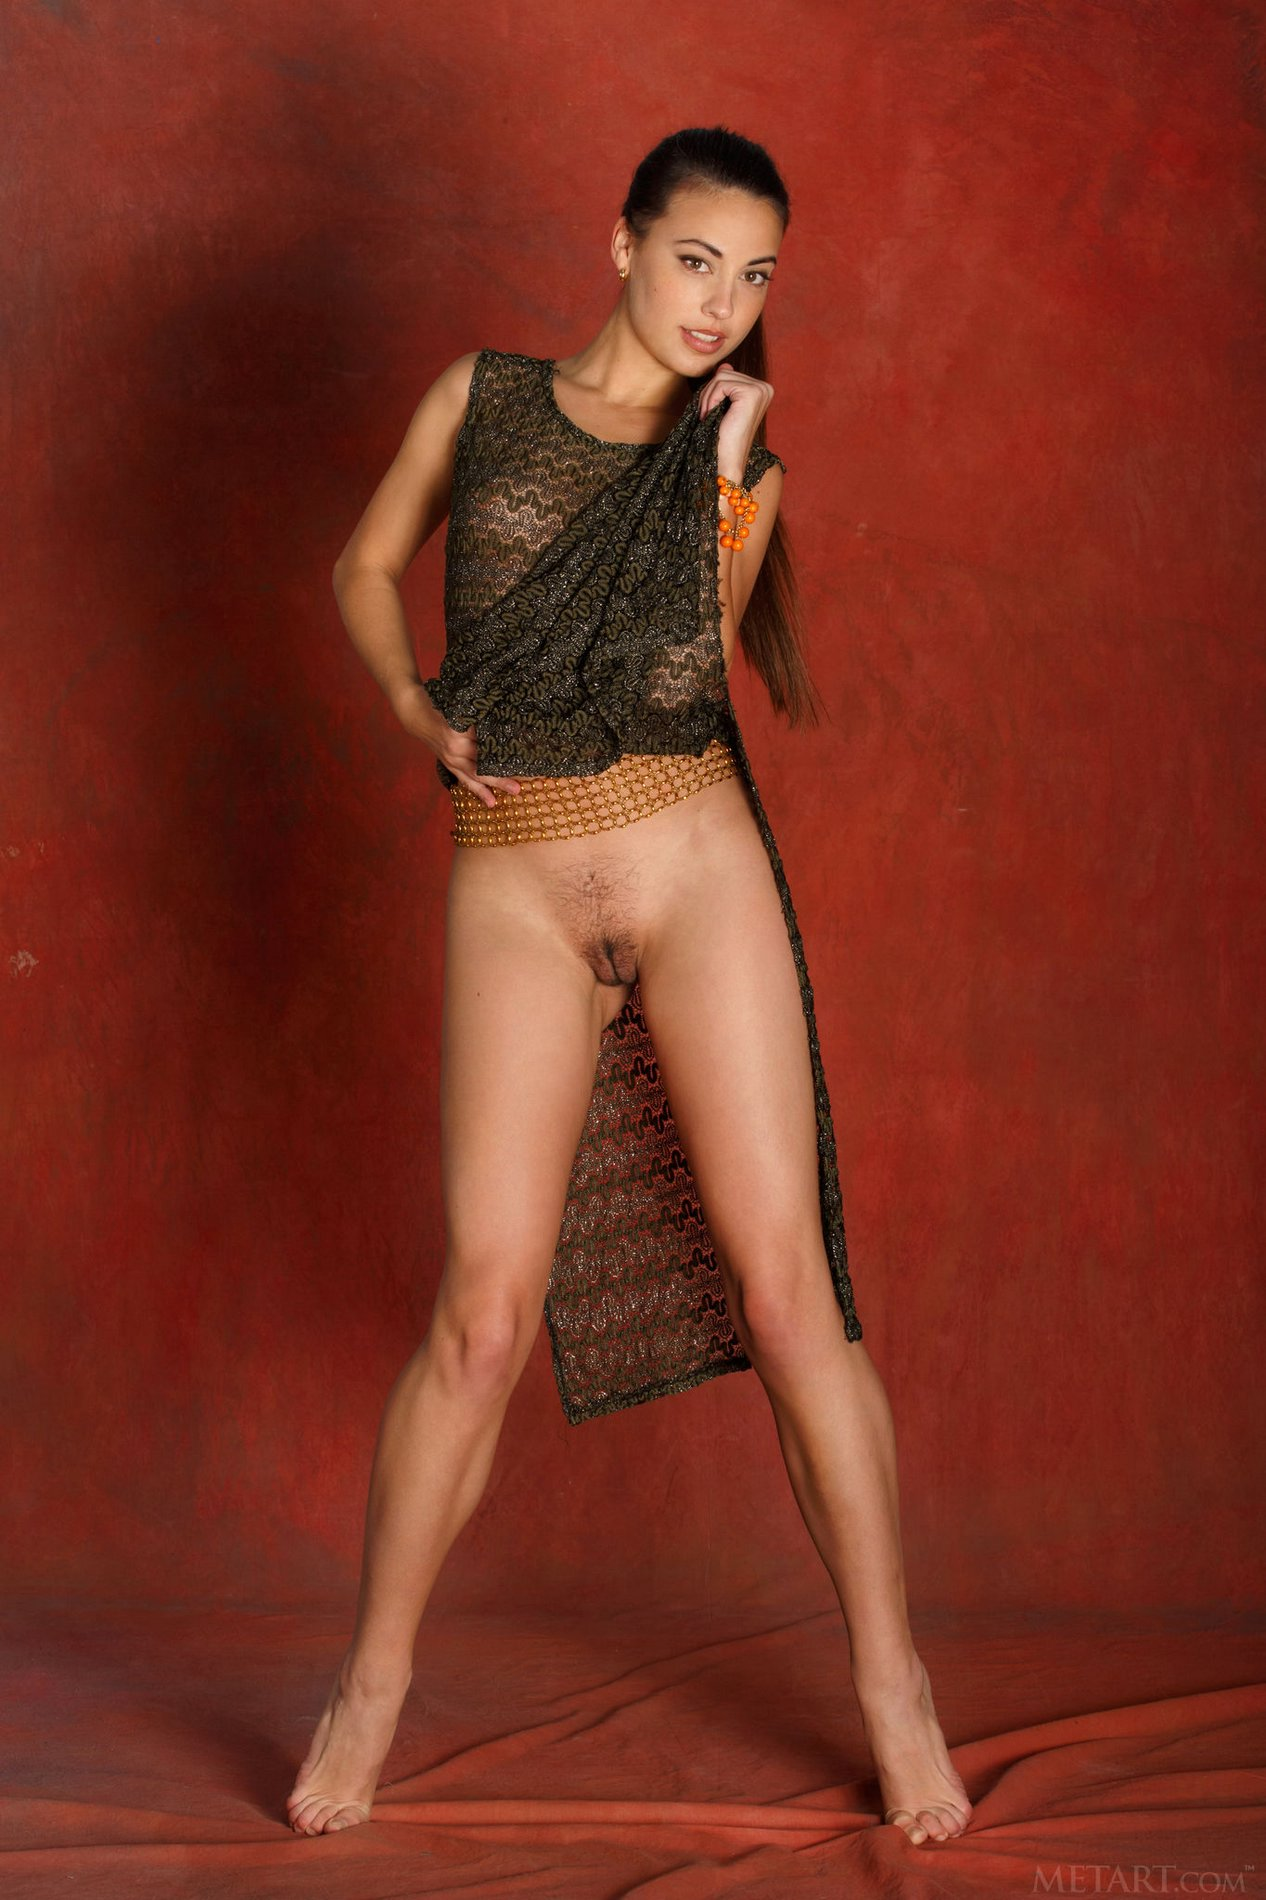 maria ozawa uncensored vids